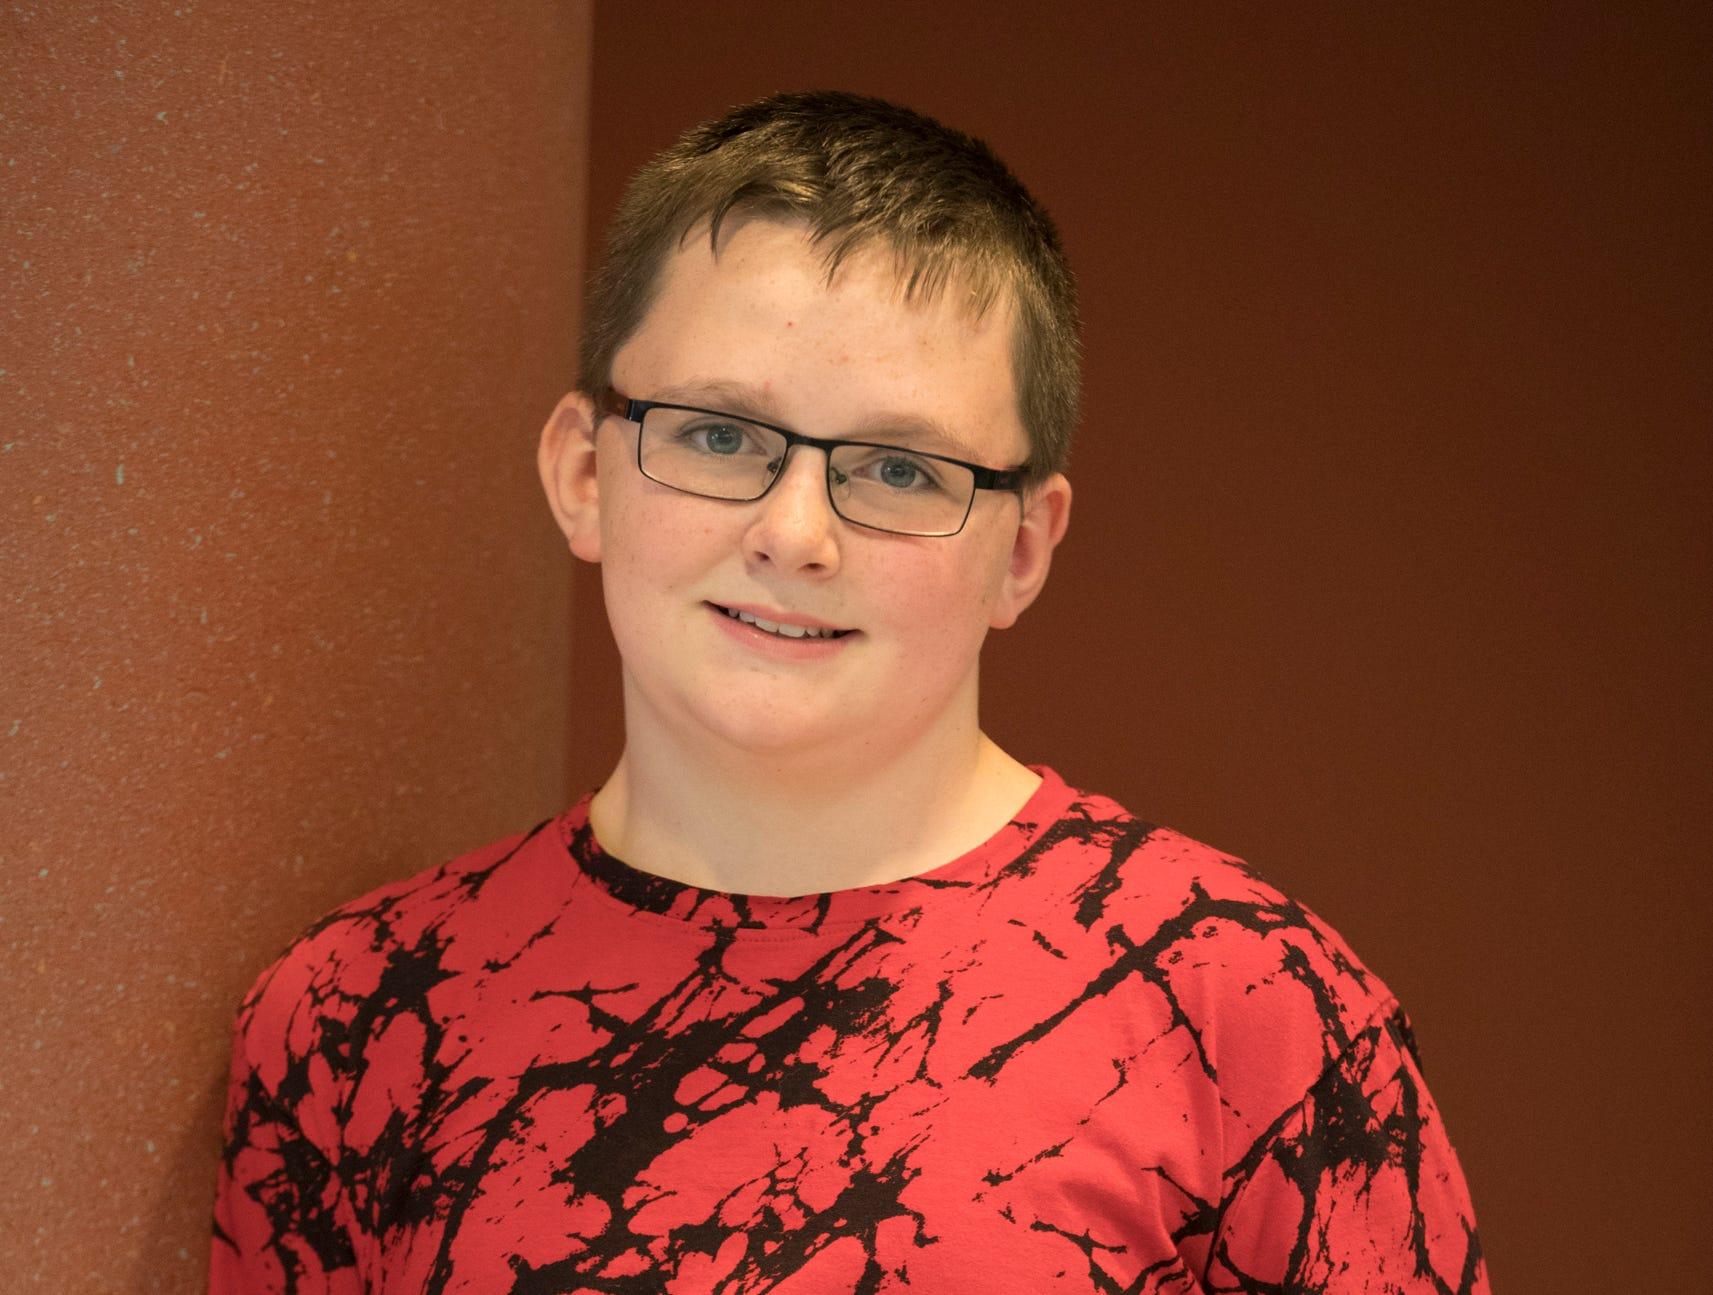 Lucas Mettler, 11, Turnback. Project: Fastbreak for Breakfast, Science Fun with Kitchen Chemistry